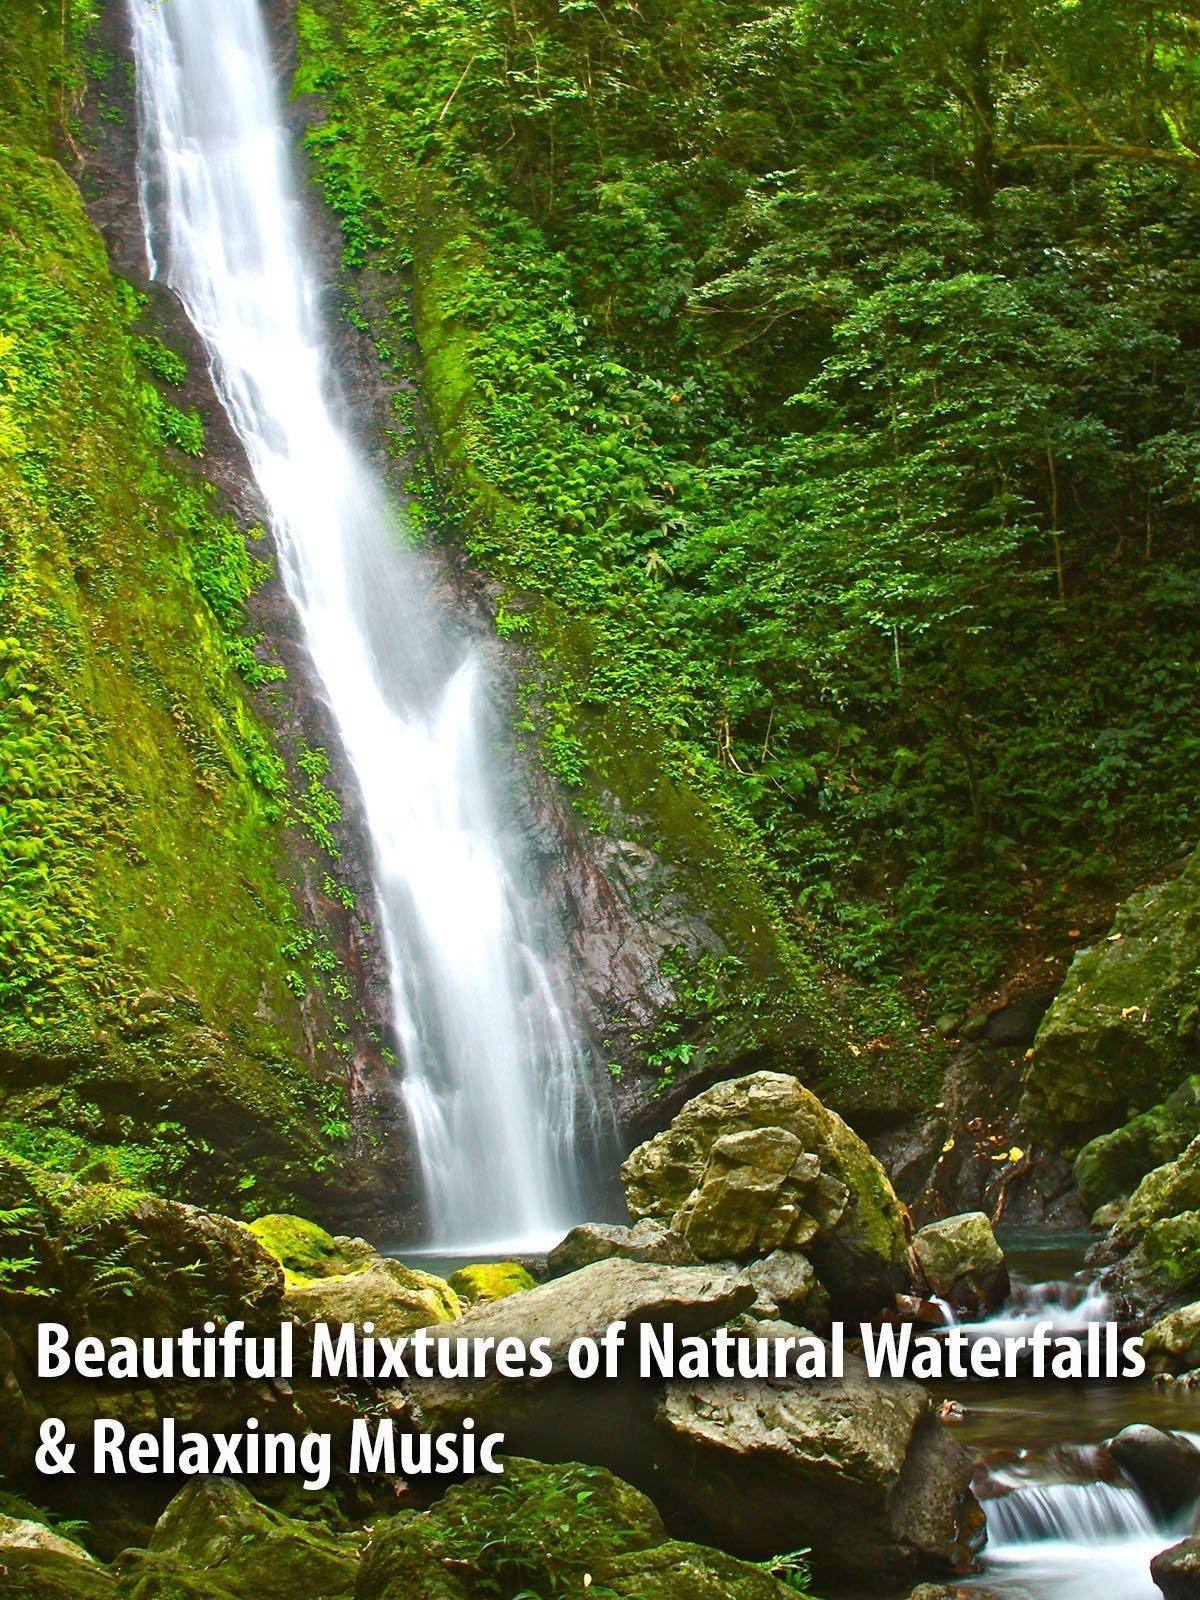 Beautiful Mixtures of Natural Waterfalls & Relaxing Music